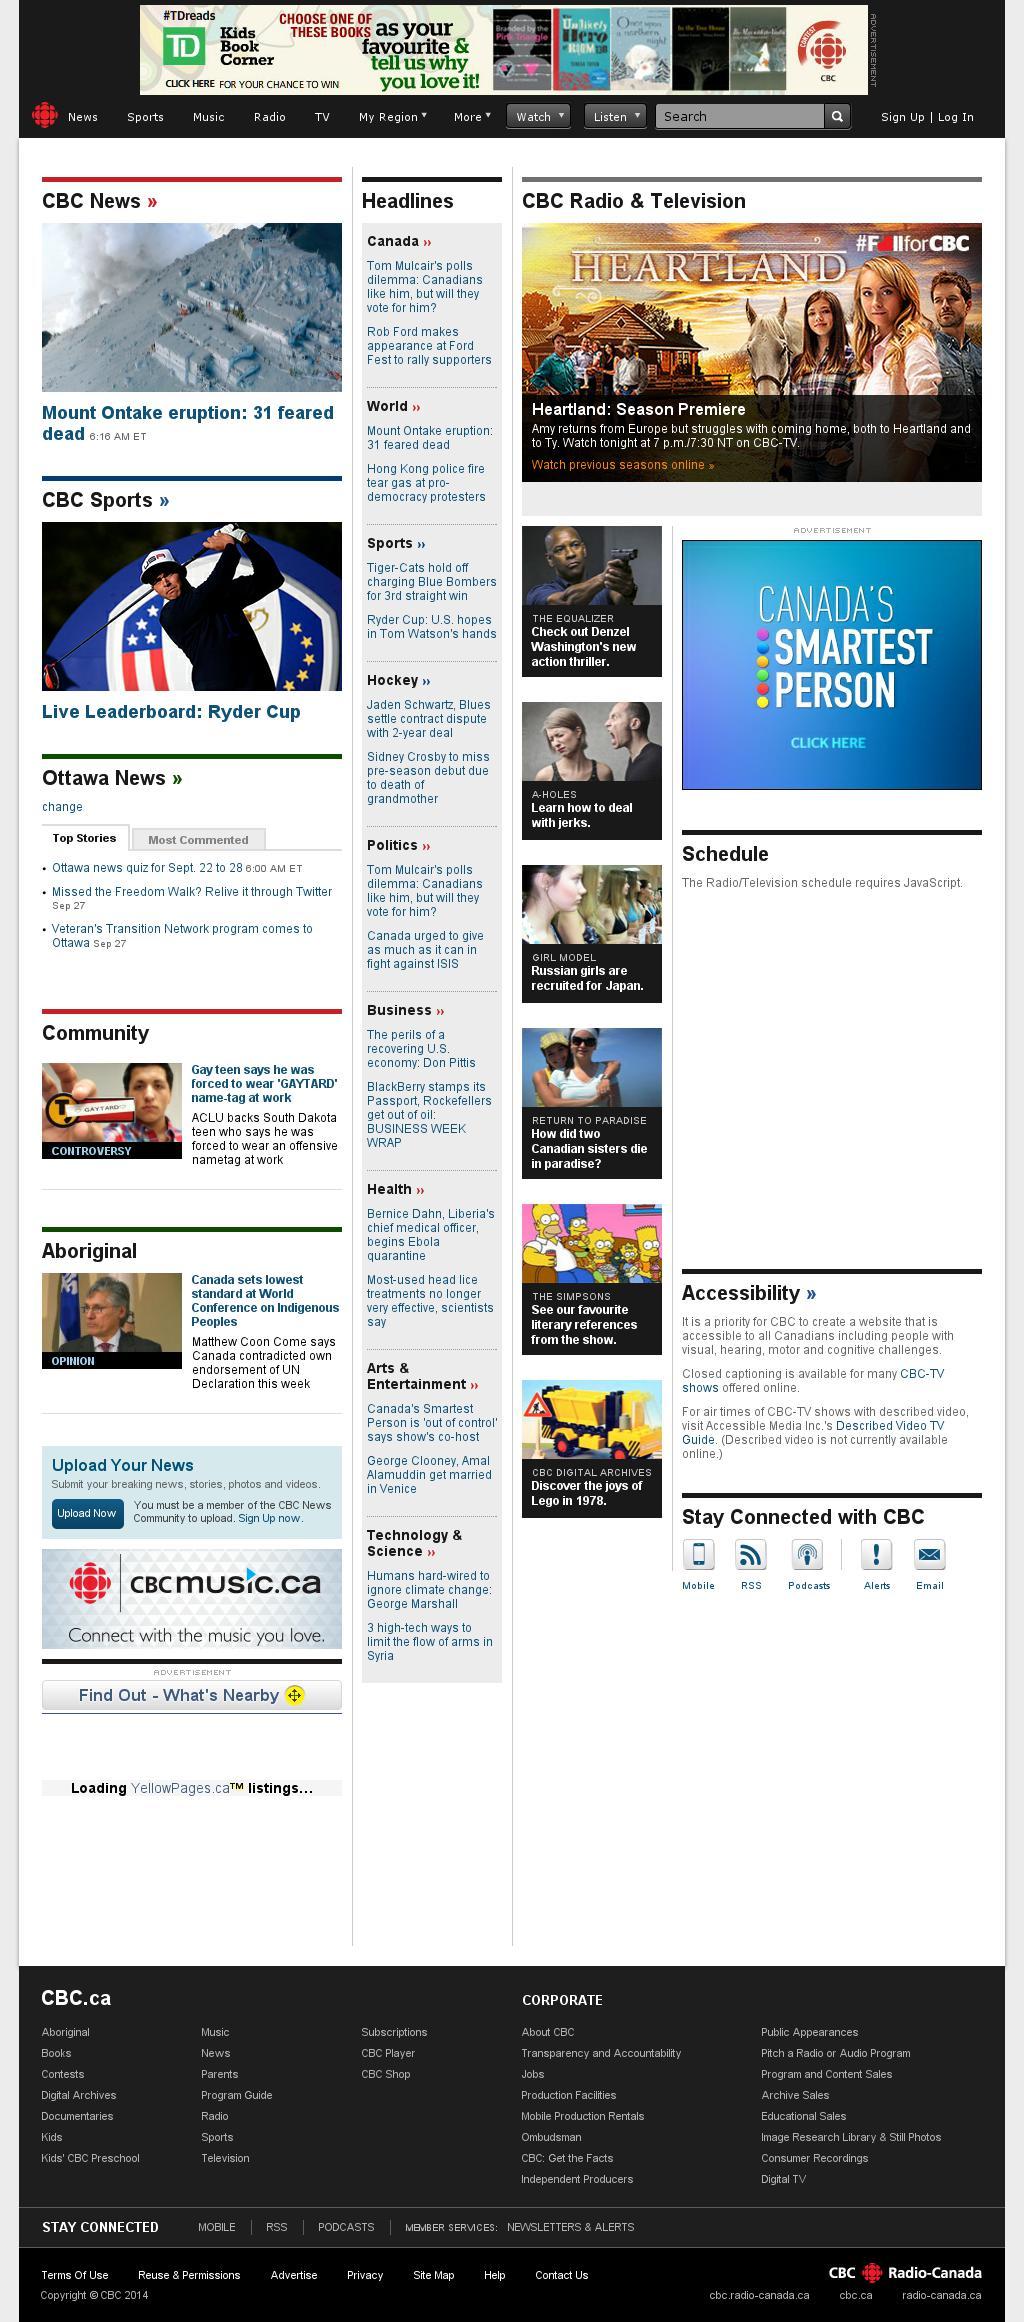 CBC at Sunday Sept. 28, 2014, 11:02 a.m. UTC